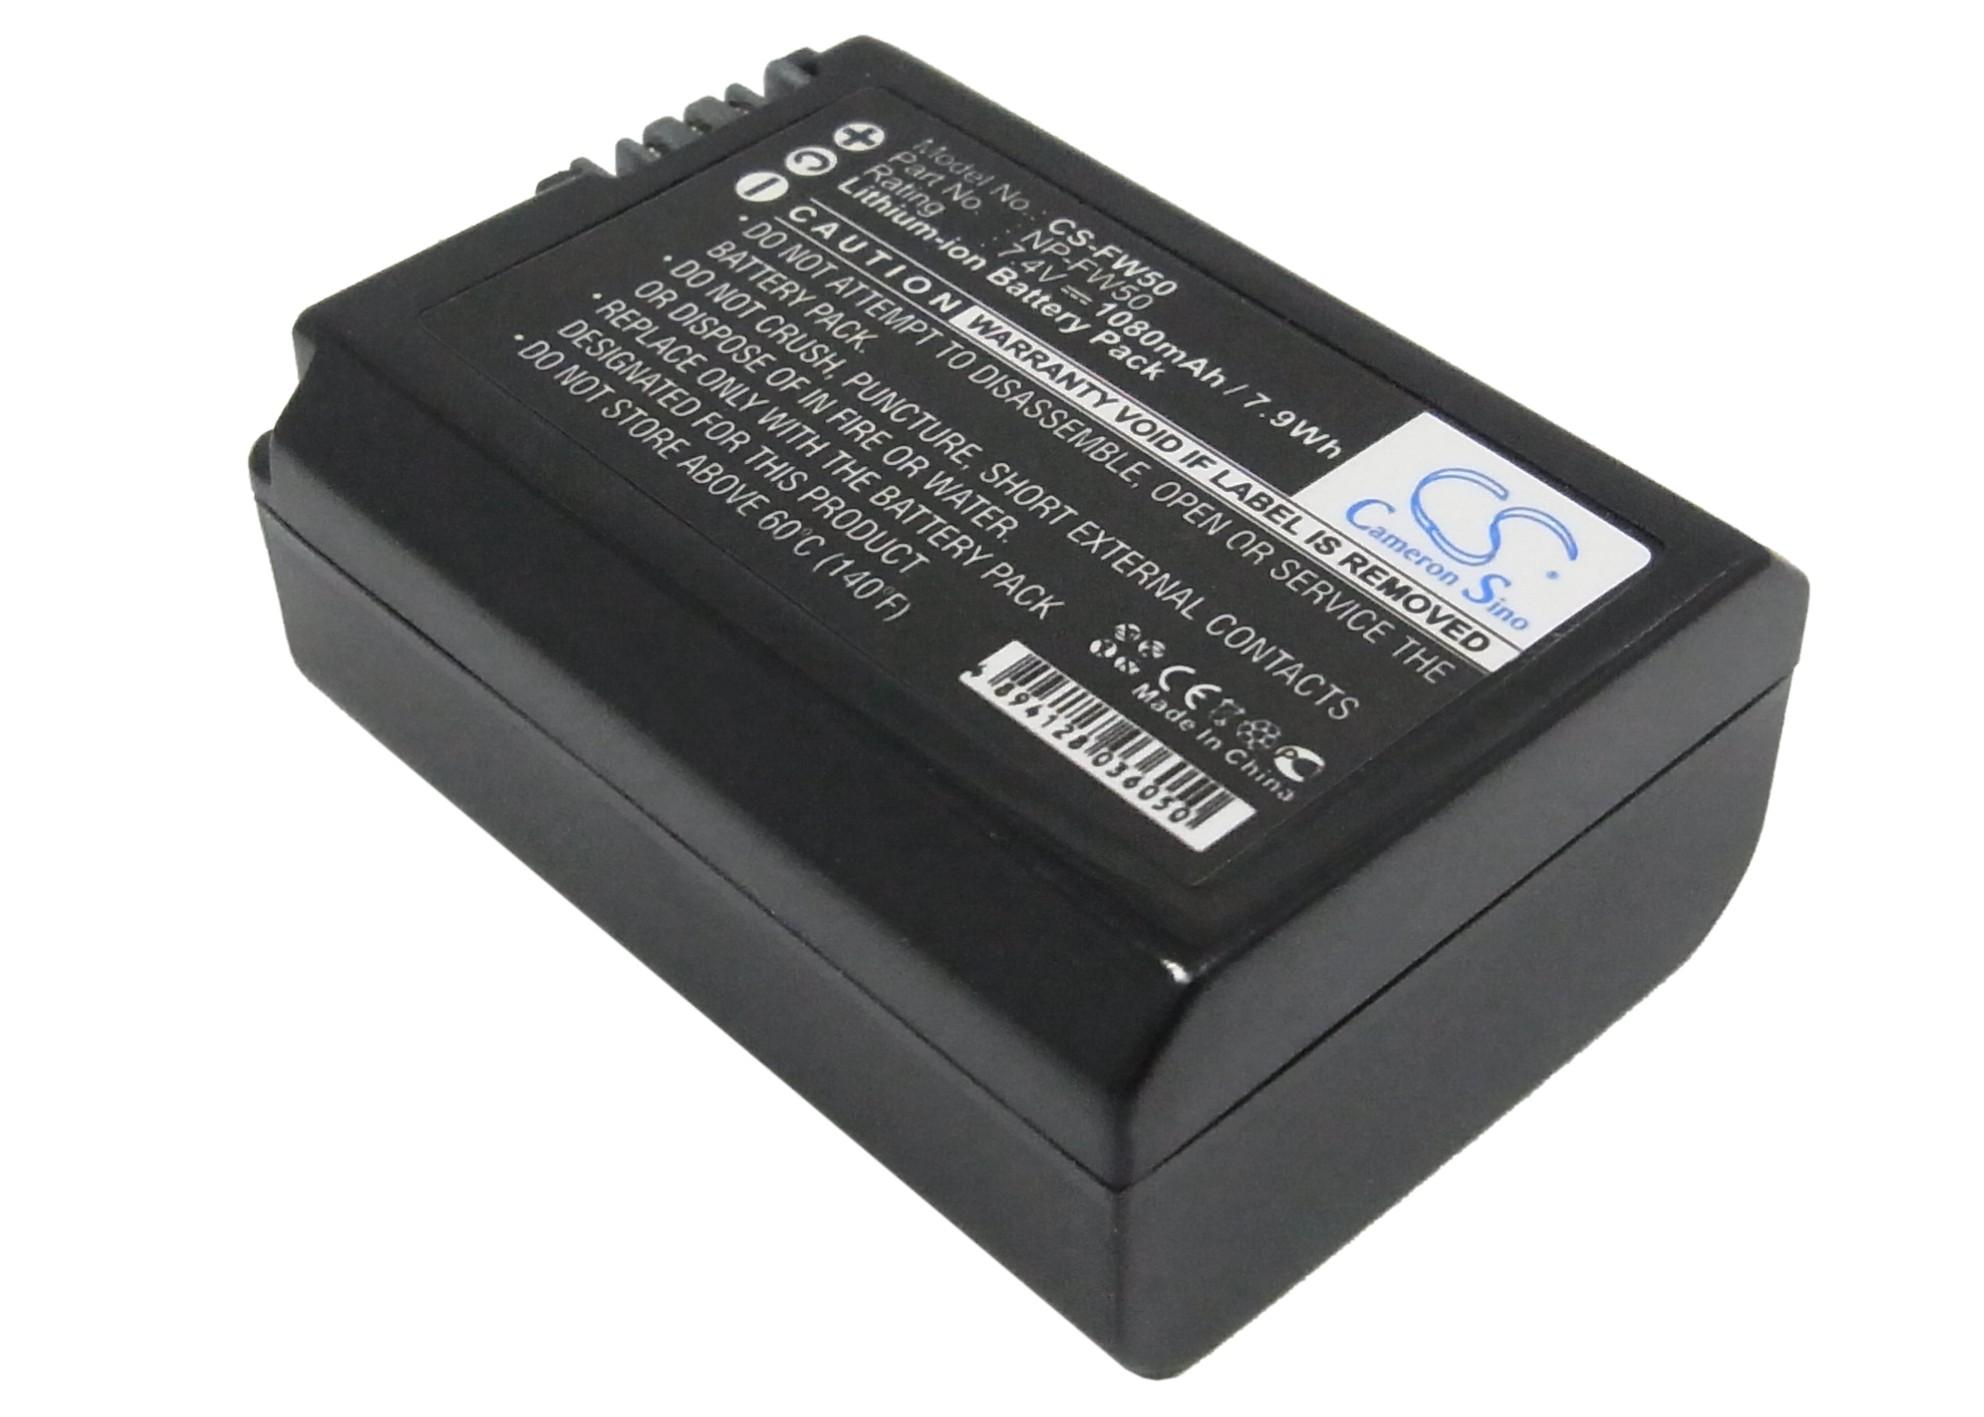 Cameron Sino baterie do kamer a fotoaparátů pro SONY NEX-5 7.4V Li-ion 1080mAh černá - neoriginální